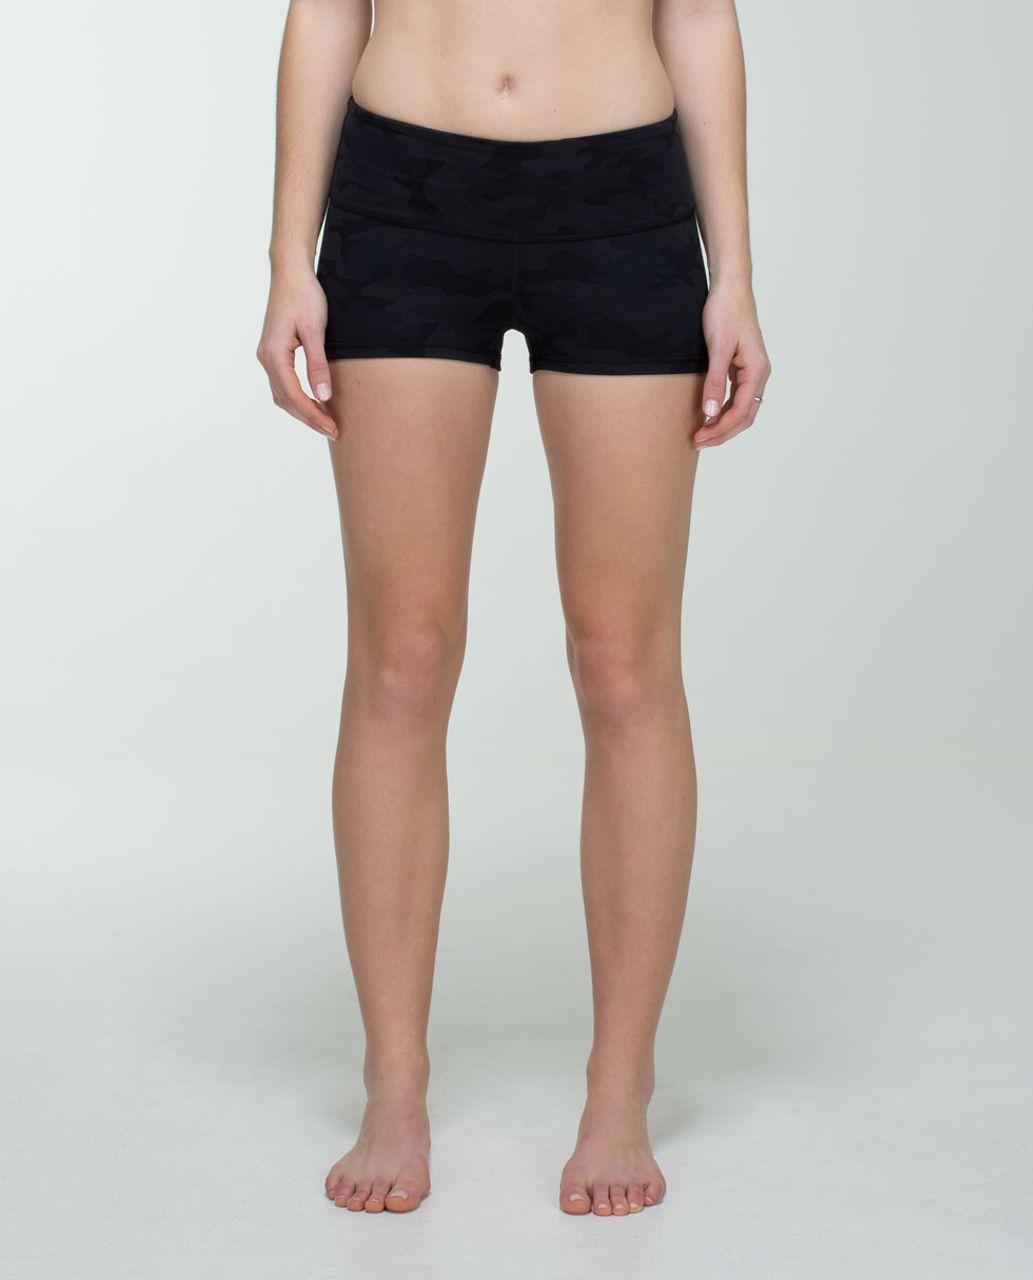 Lululemon Boogie Short - Savasana Camo 20cm New Black / Soot / Black